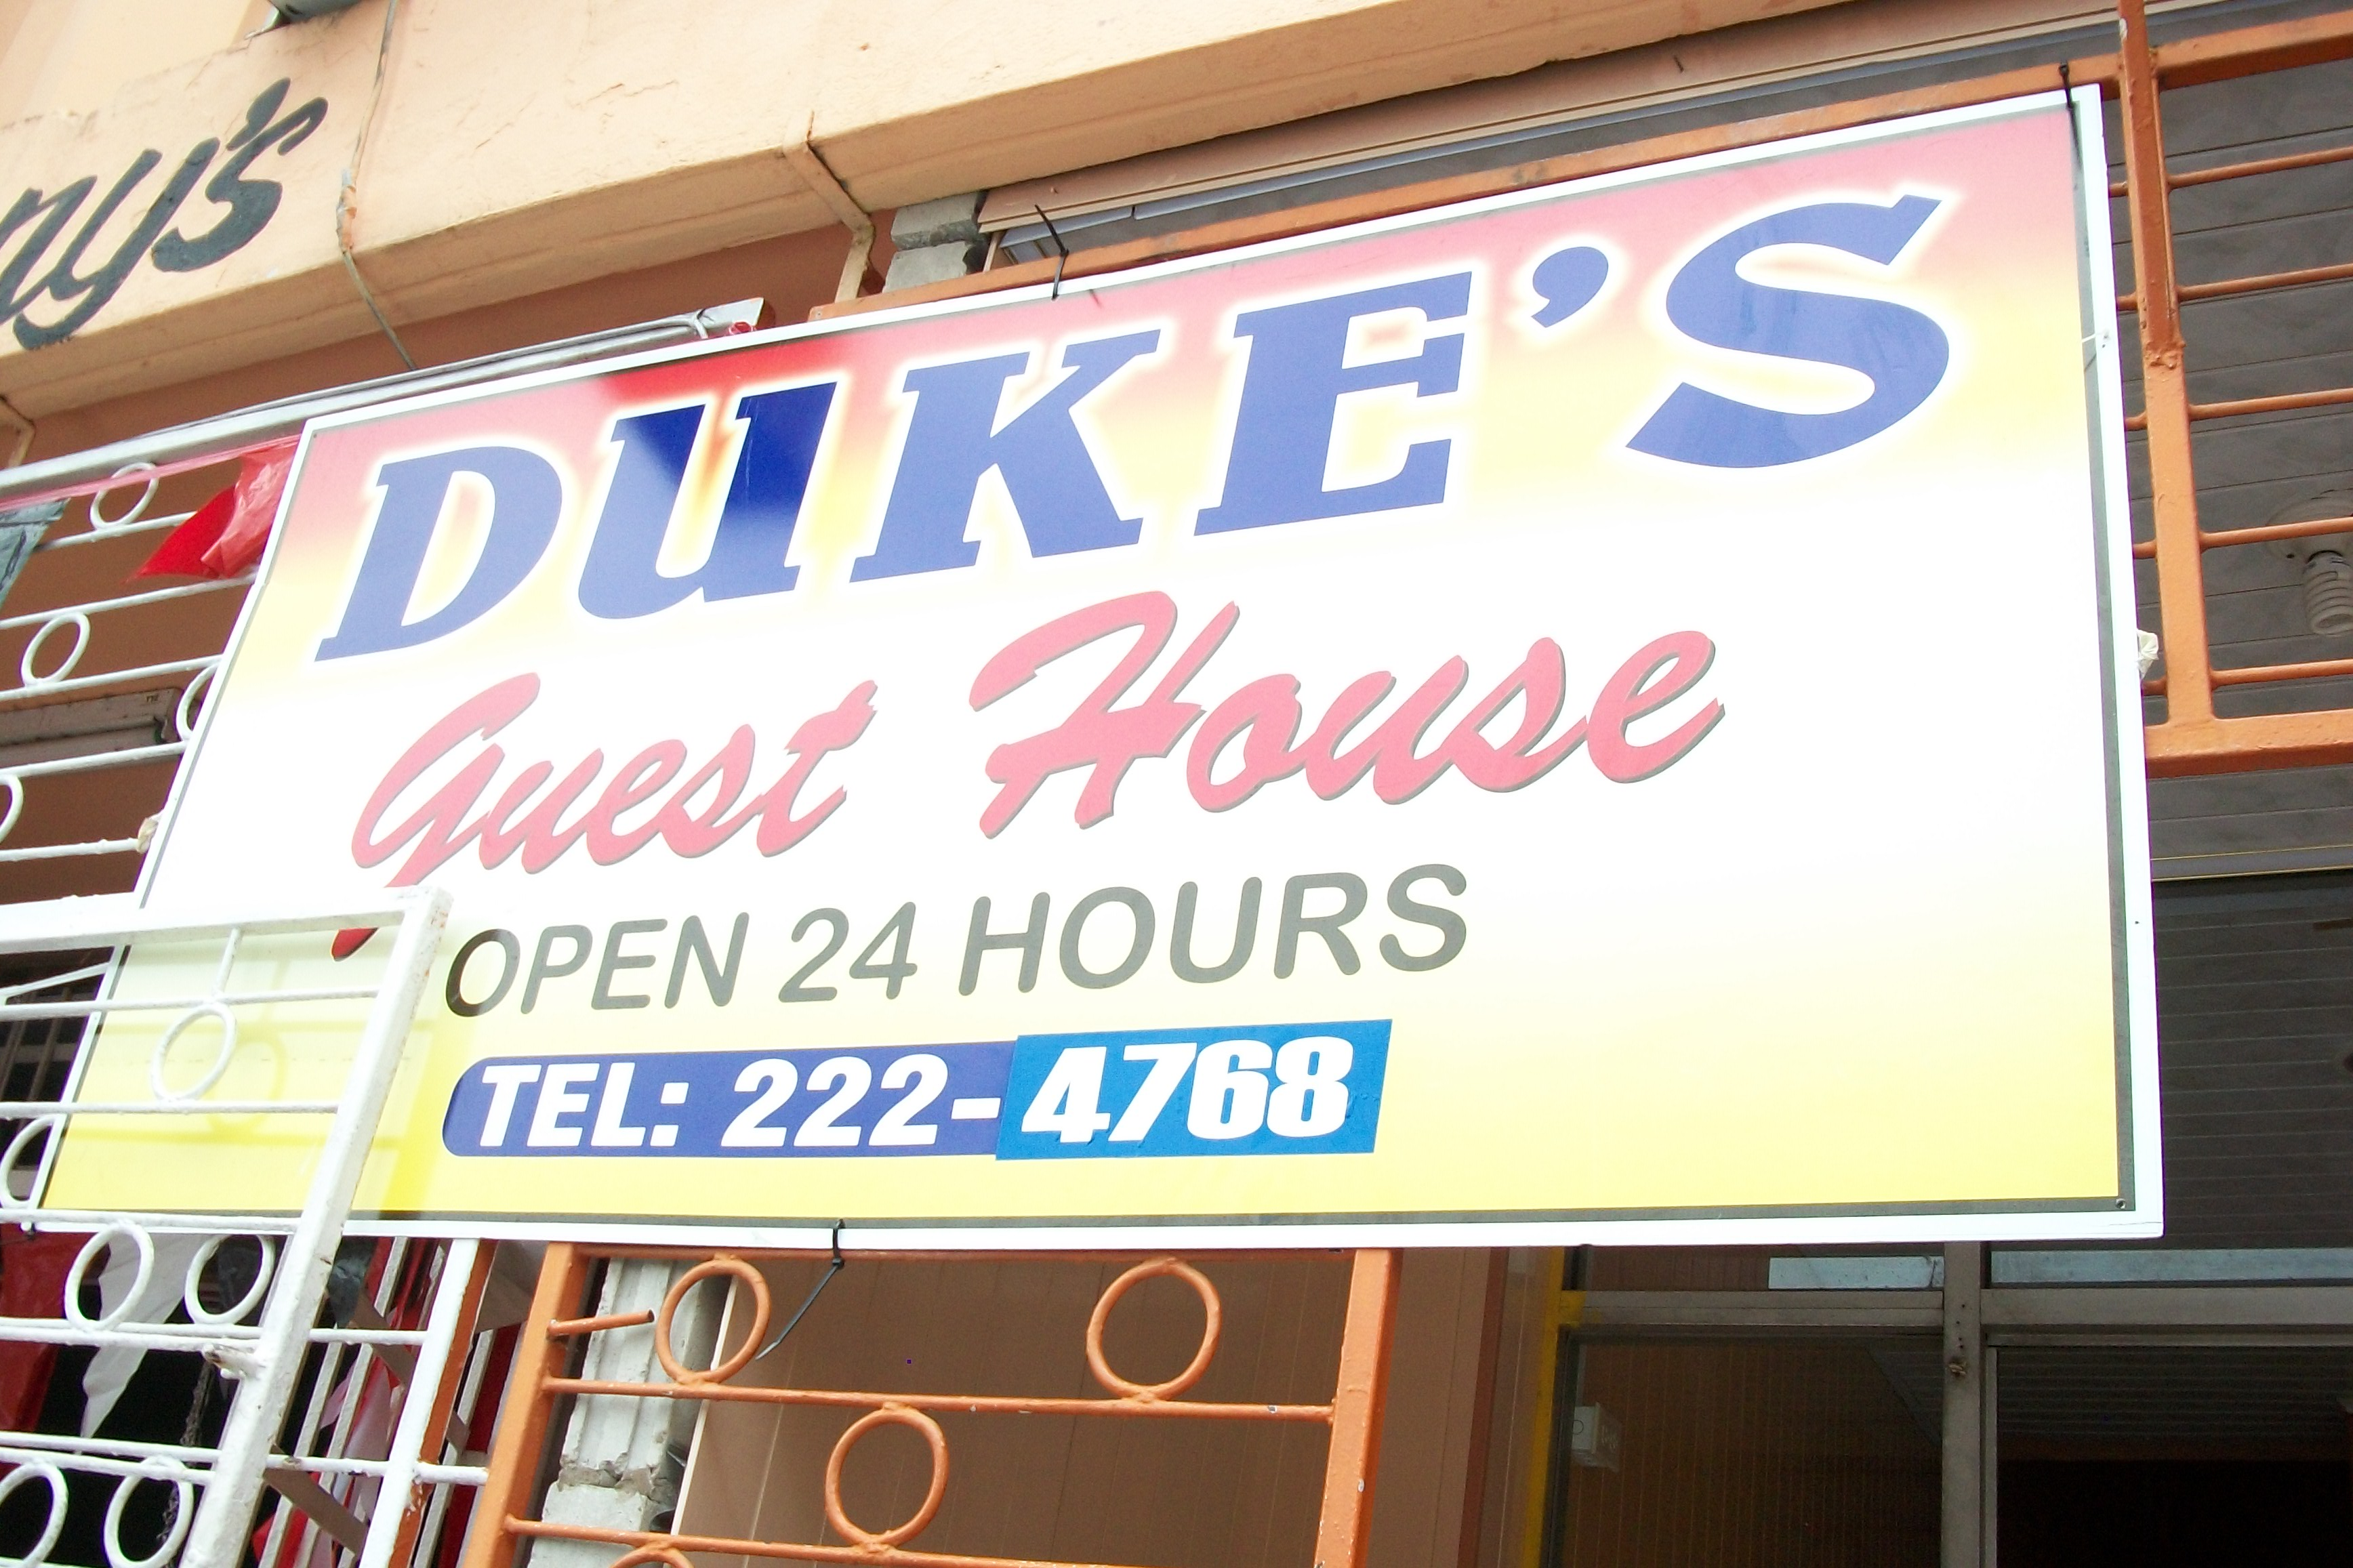 Duke's Guest House